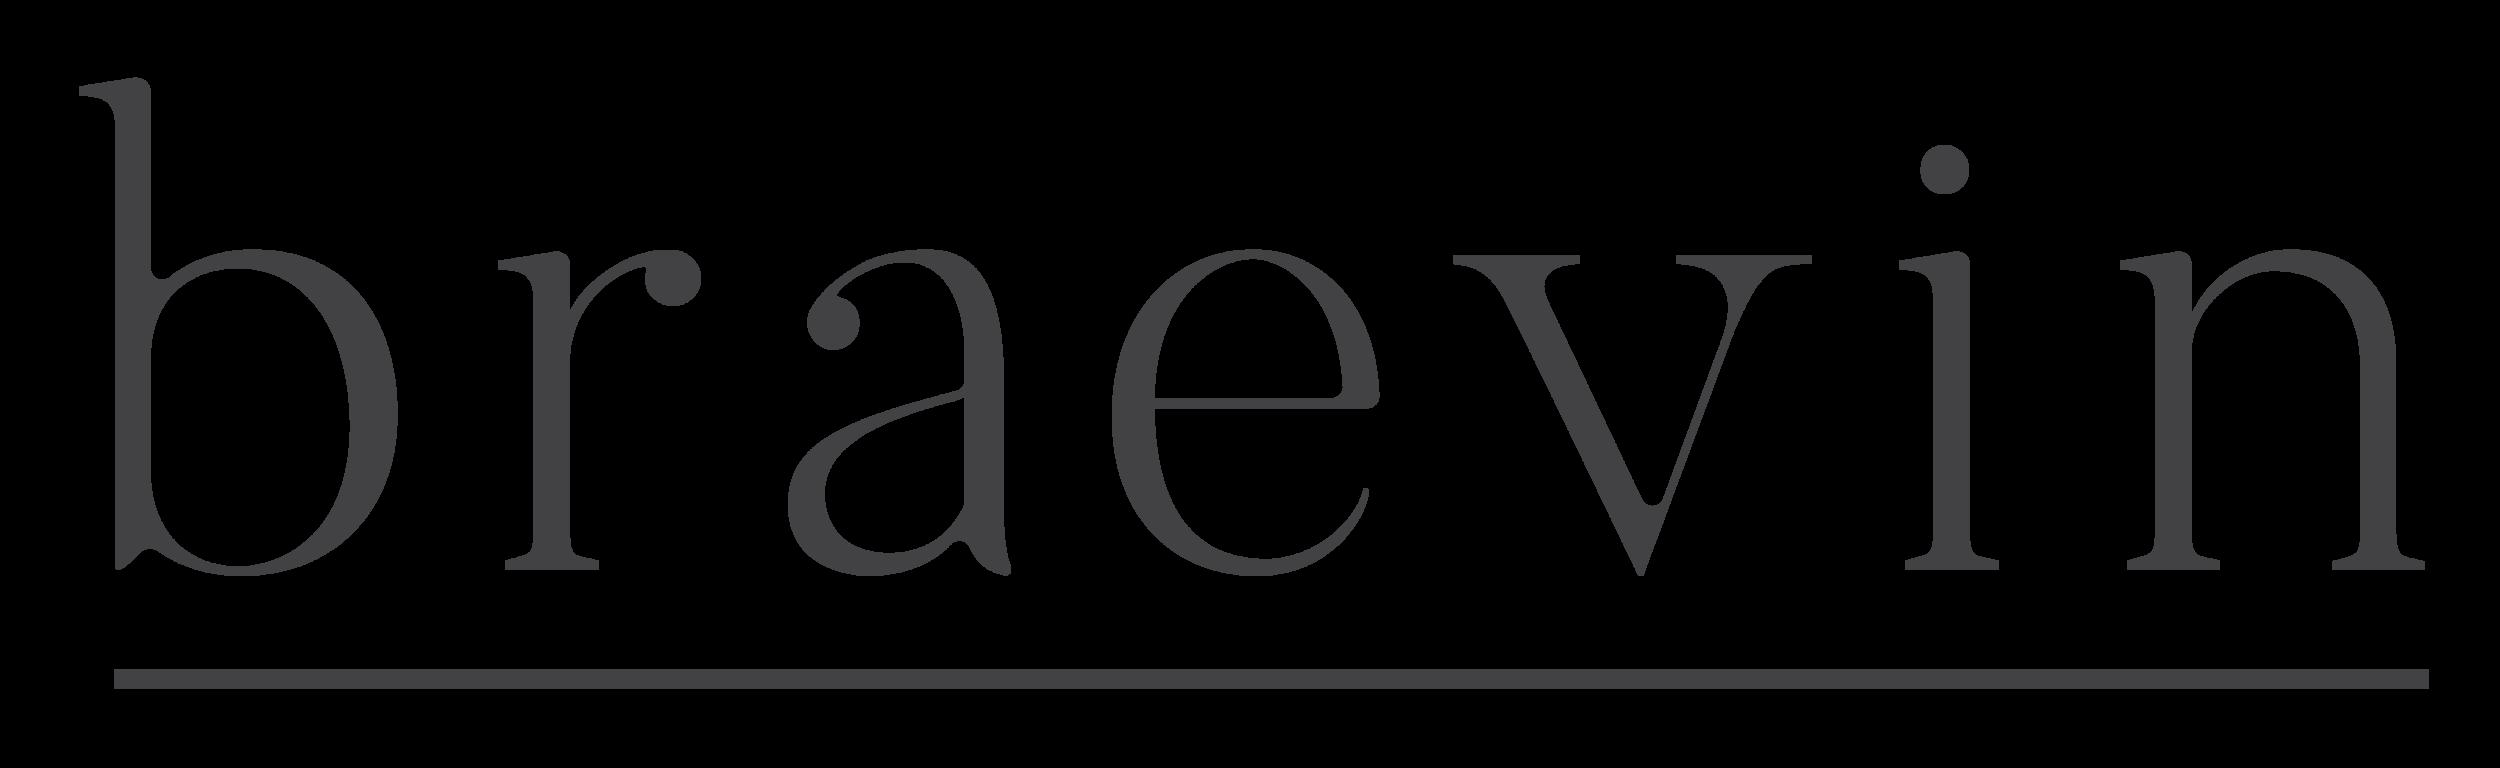 Braevin_Logo_Lockup_Dark.png